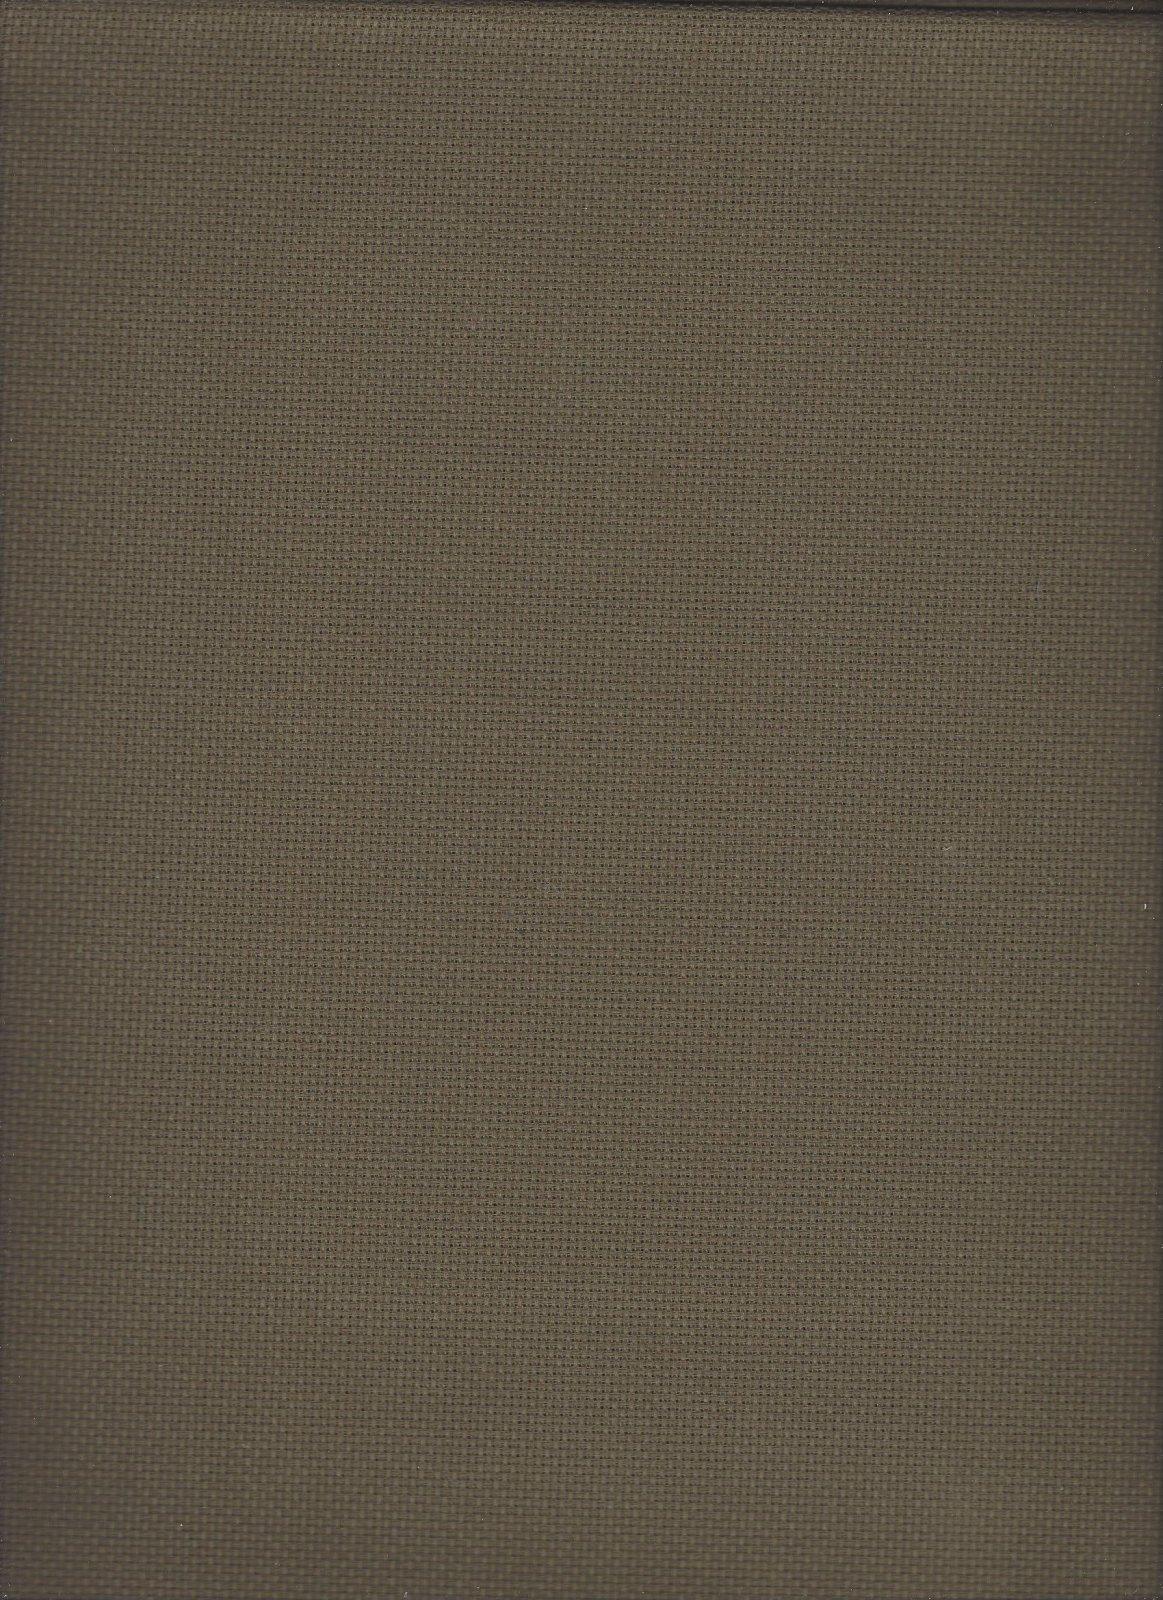 Aida 16ct Nutmeg (discontinued color)